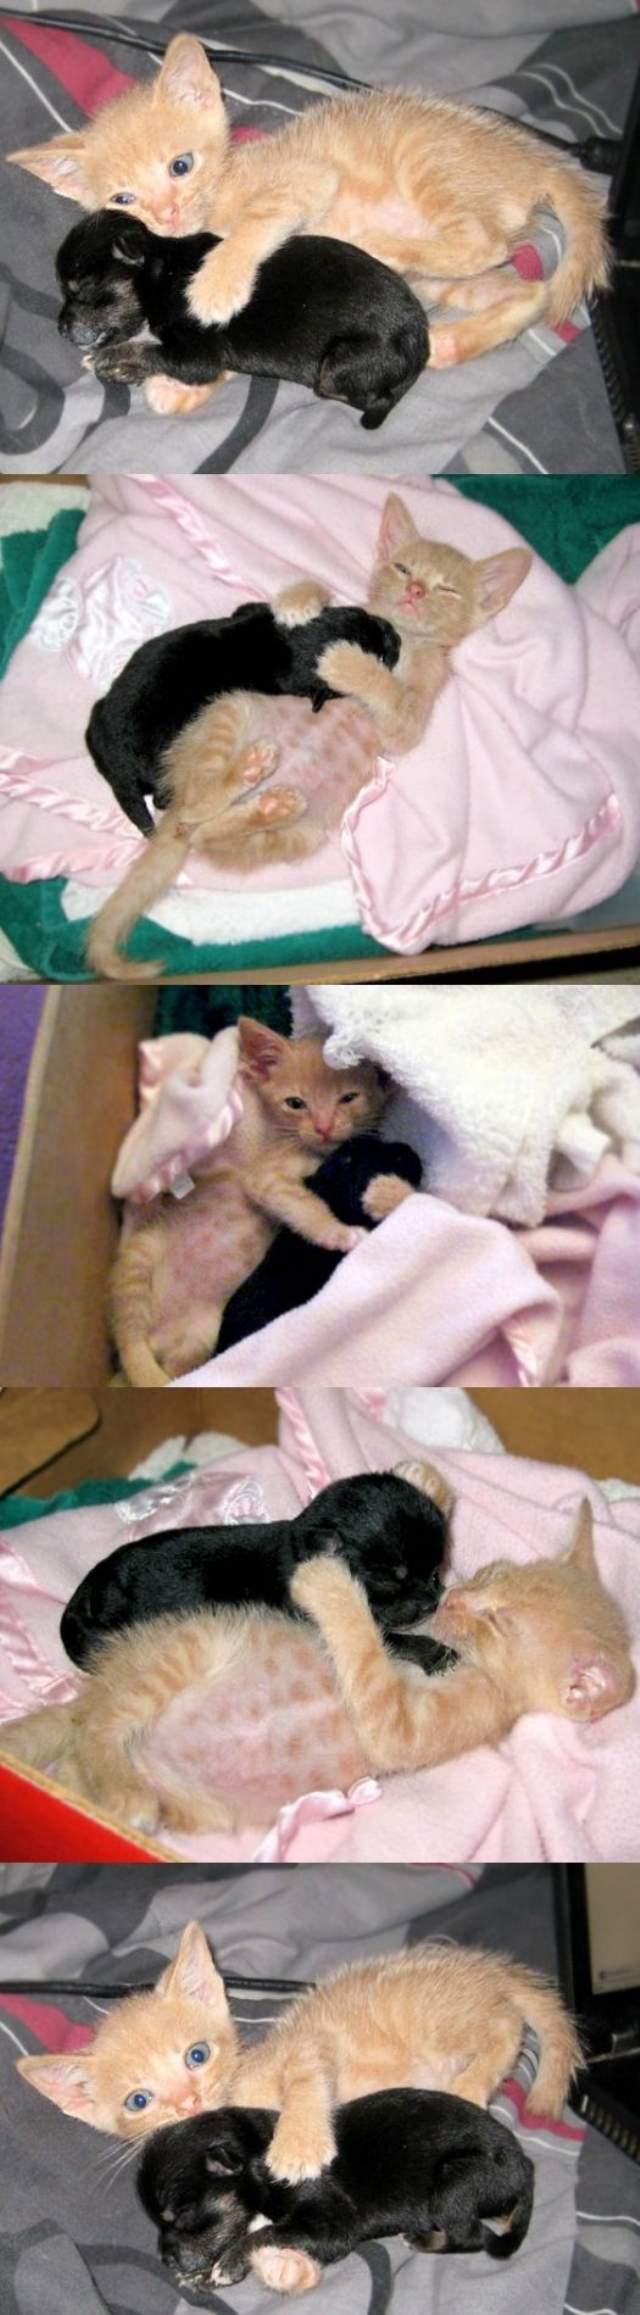 Unusual Animal Friendships Puppy Kitten Friends